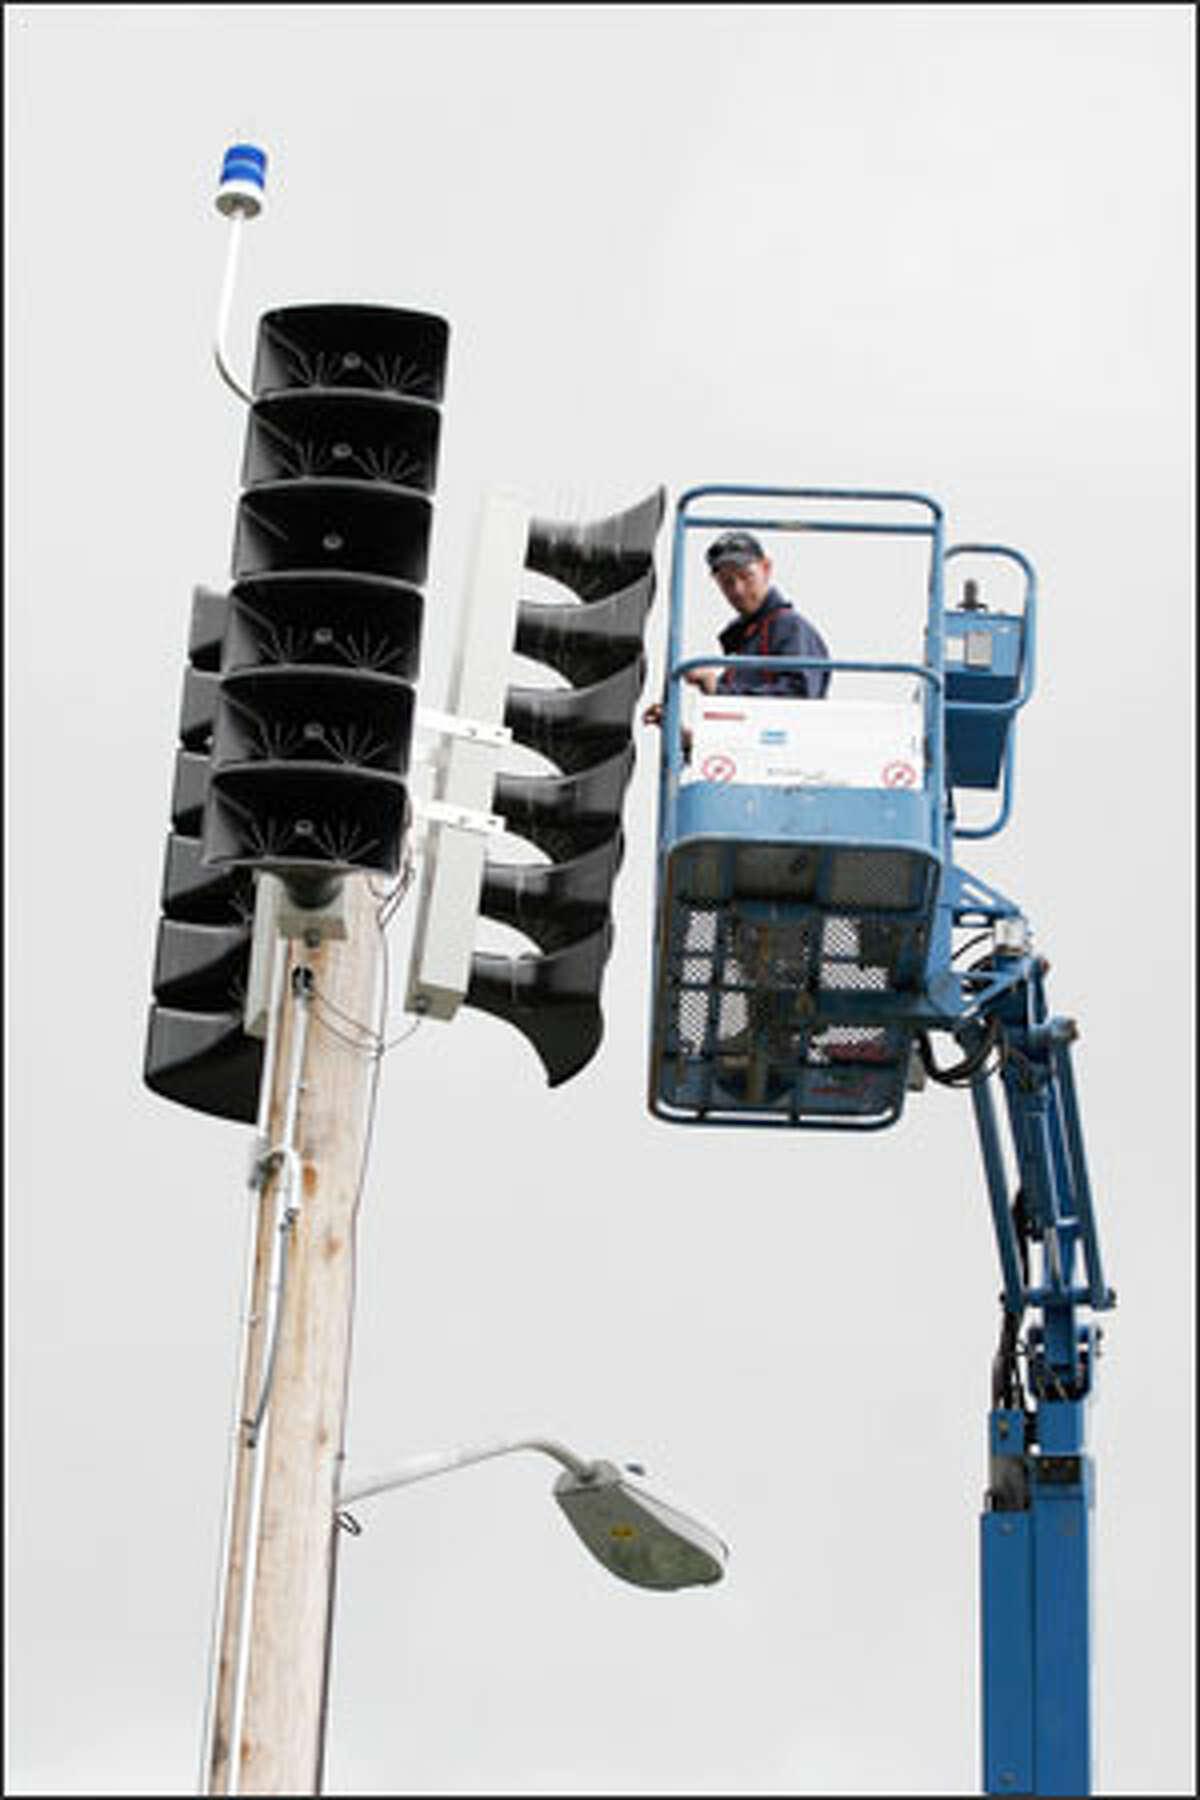 Merit Electric worker Brett Lineback of Spokane installs bird spikes on the new hazardous- warning speakers on Western Avenue yesterday.